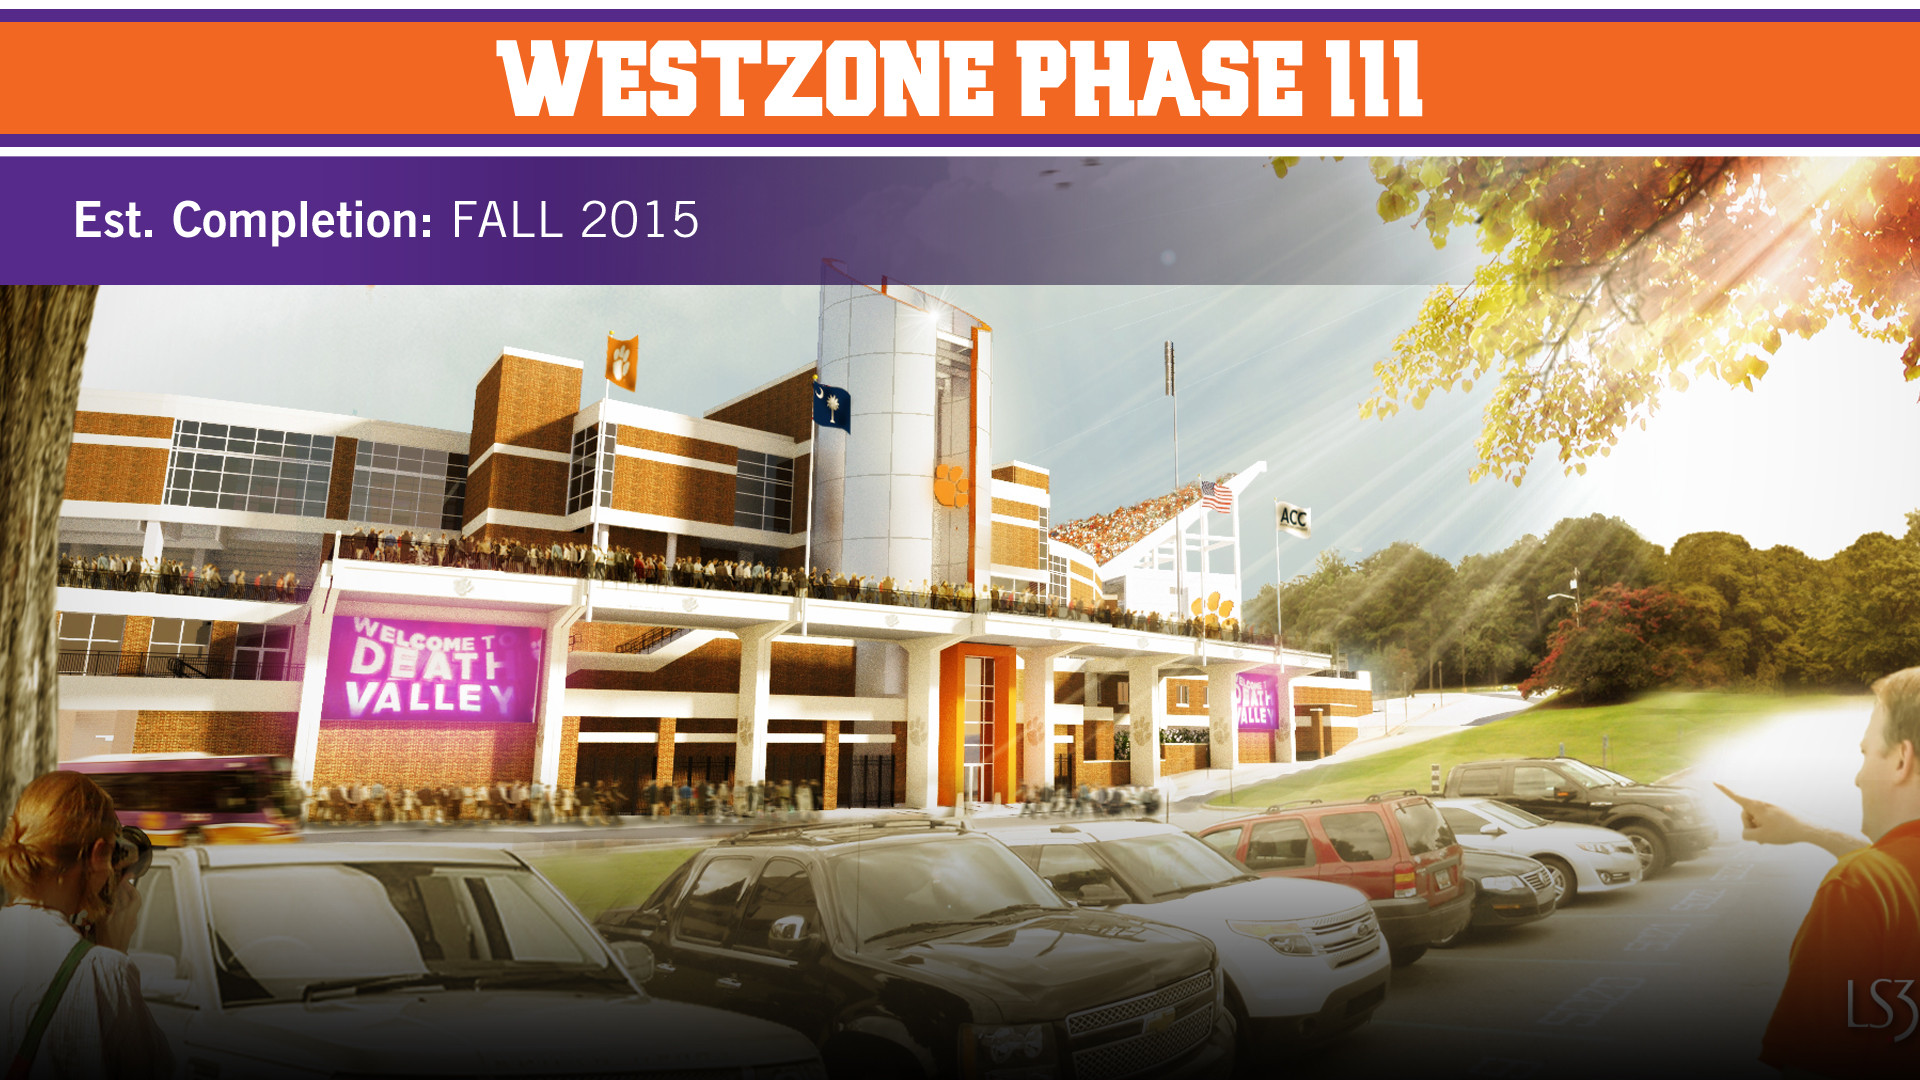 WestZone Phase III